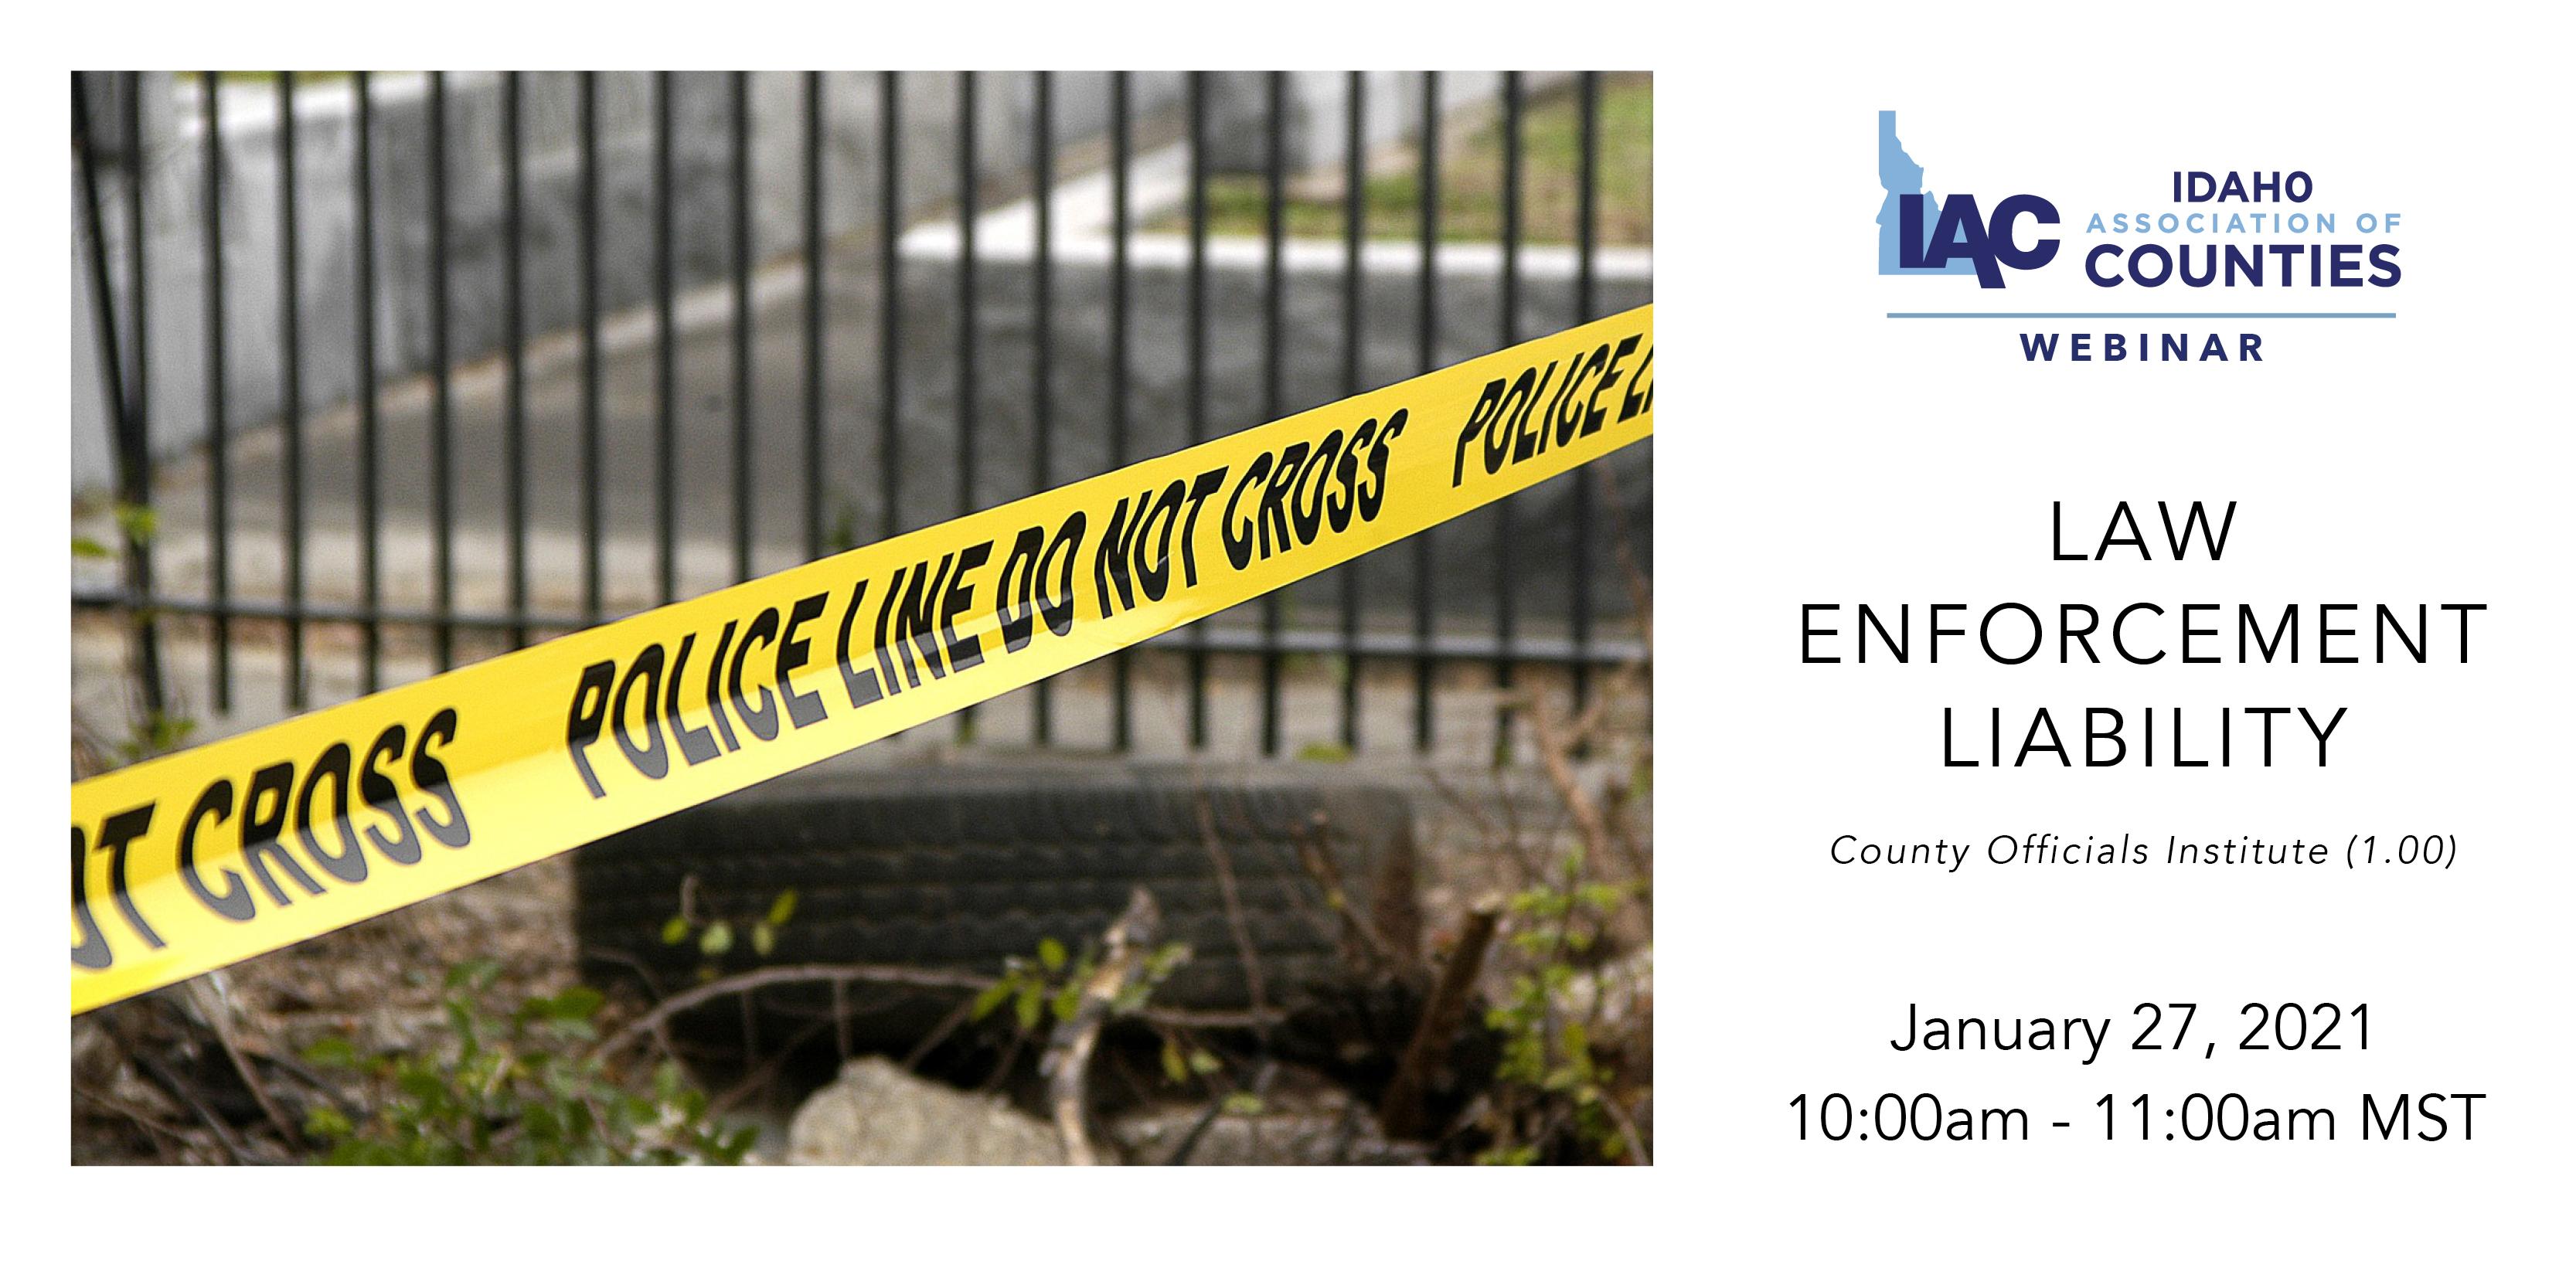 IAC Webinar: Law Enforcement Liability